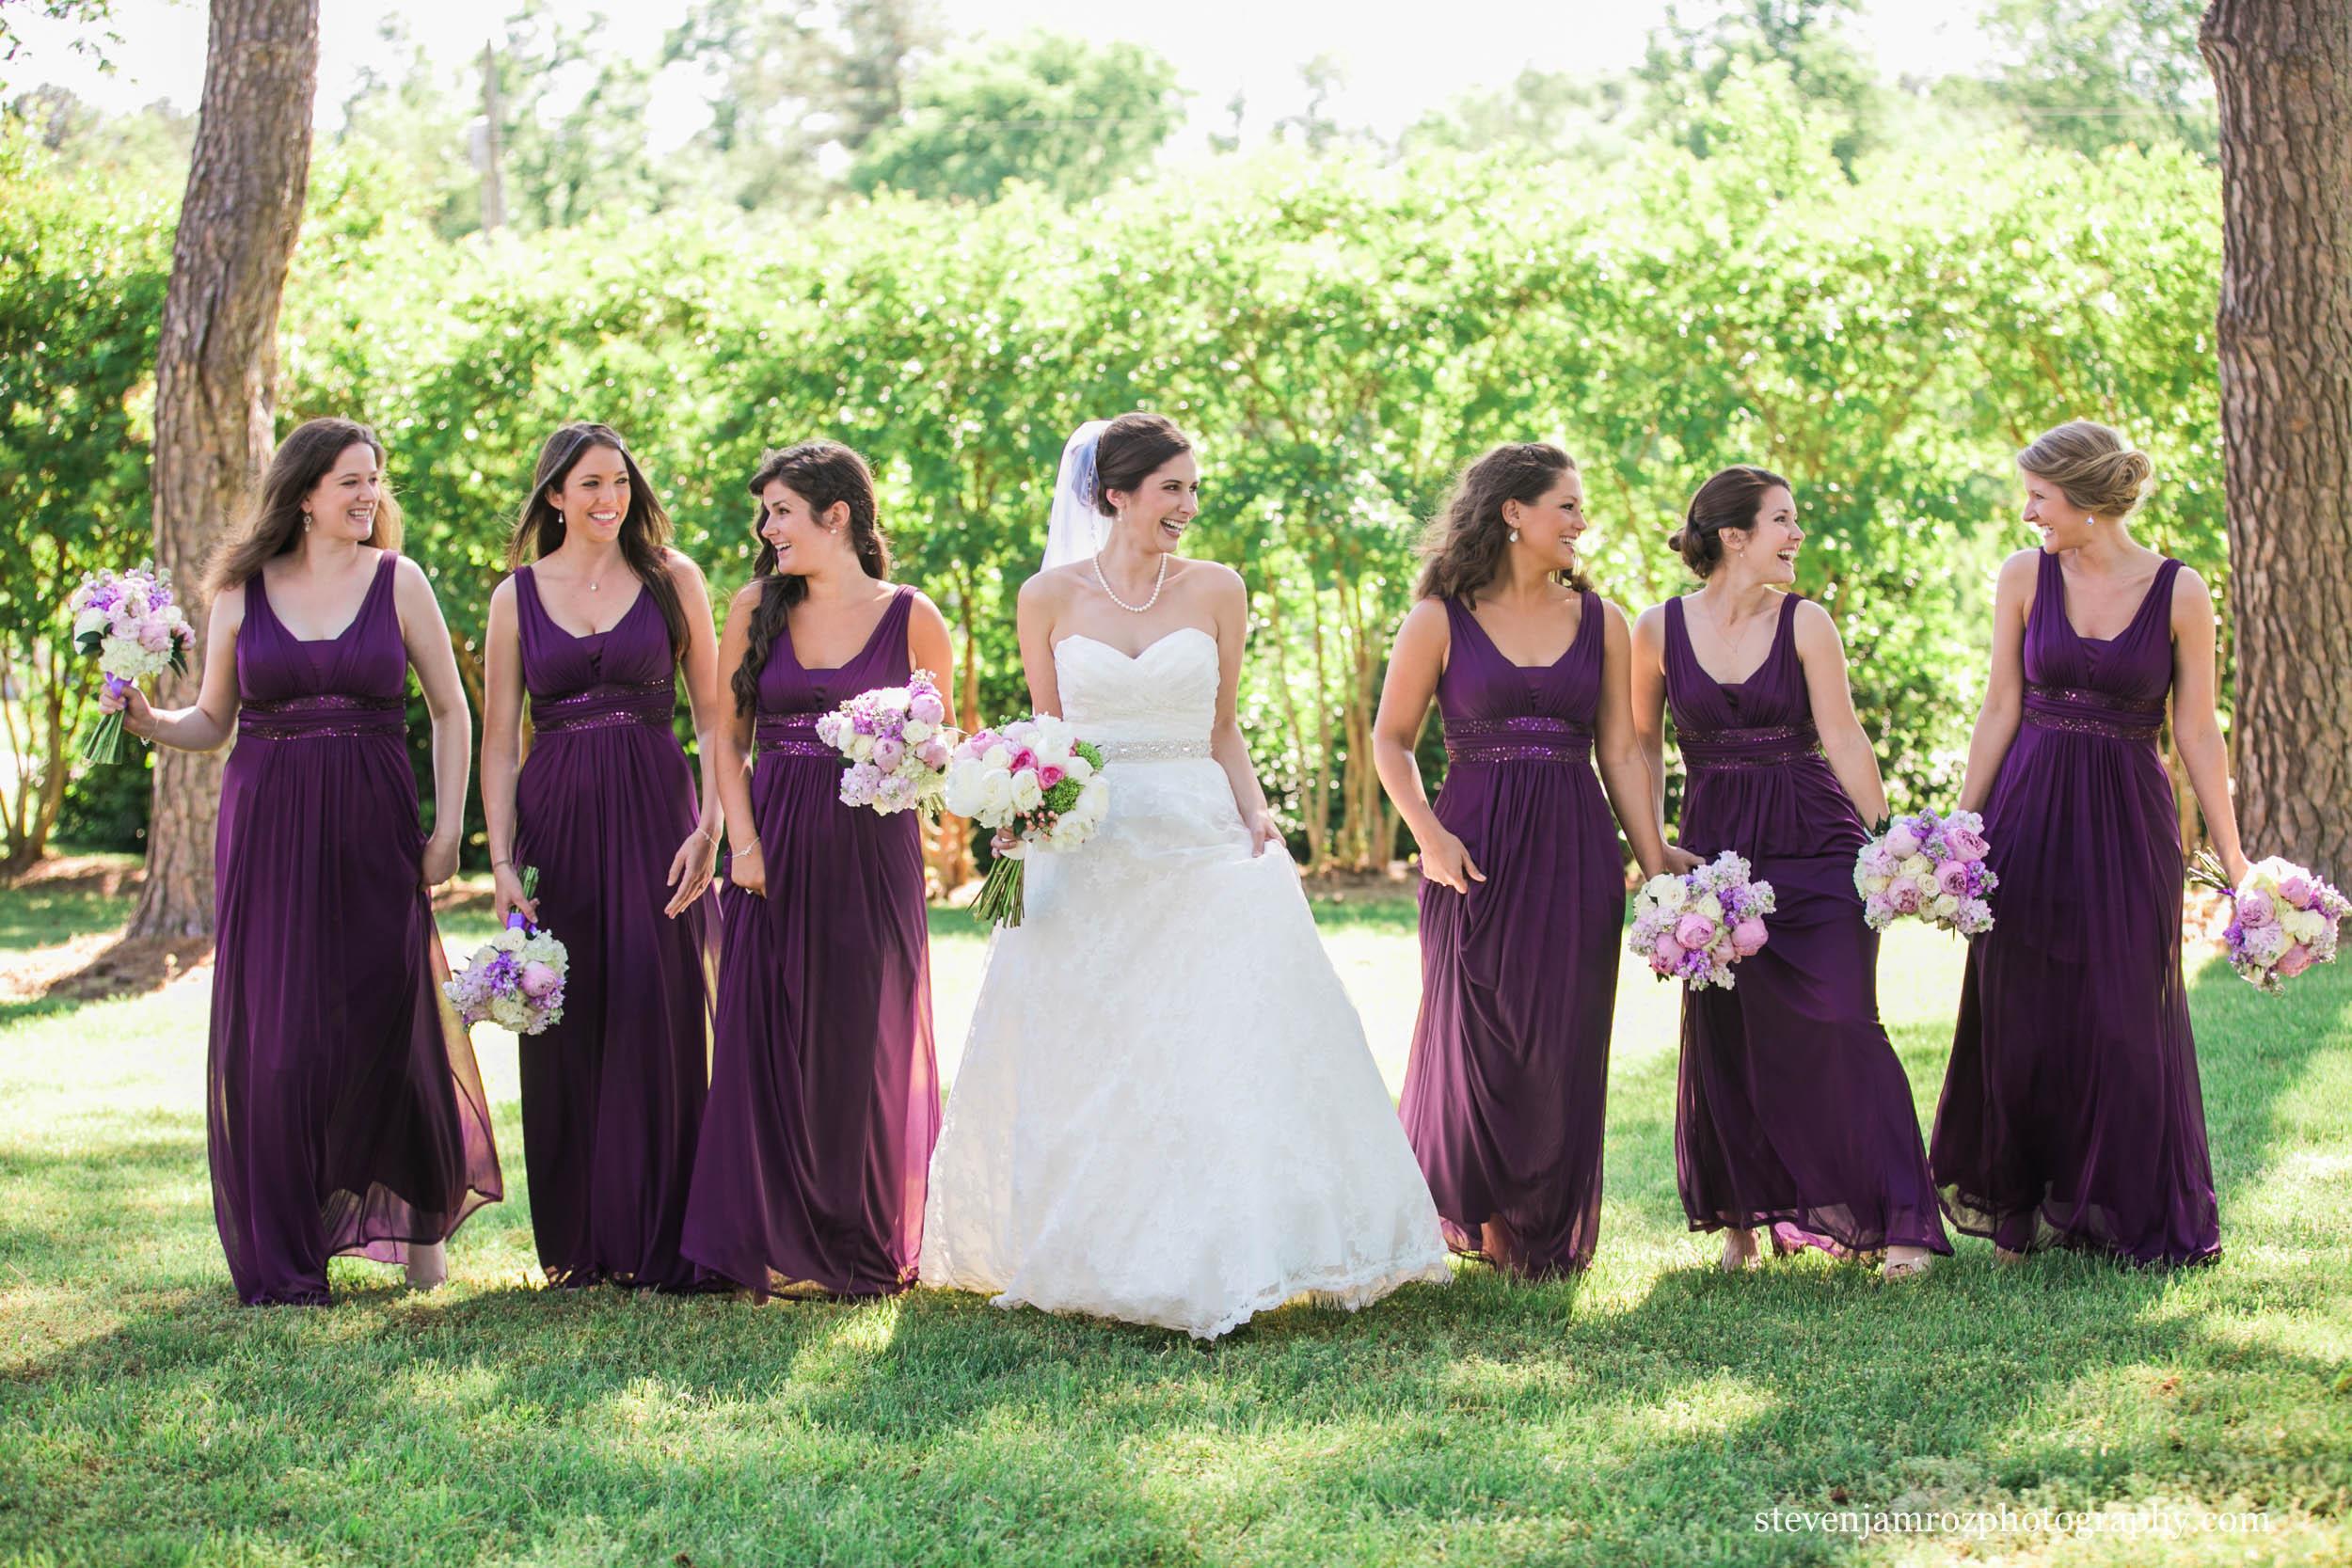 front-lawn-hudson-manor-bridesmaids-steven-jamroz-photography-0329.jpg